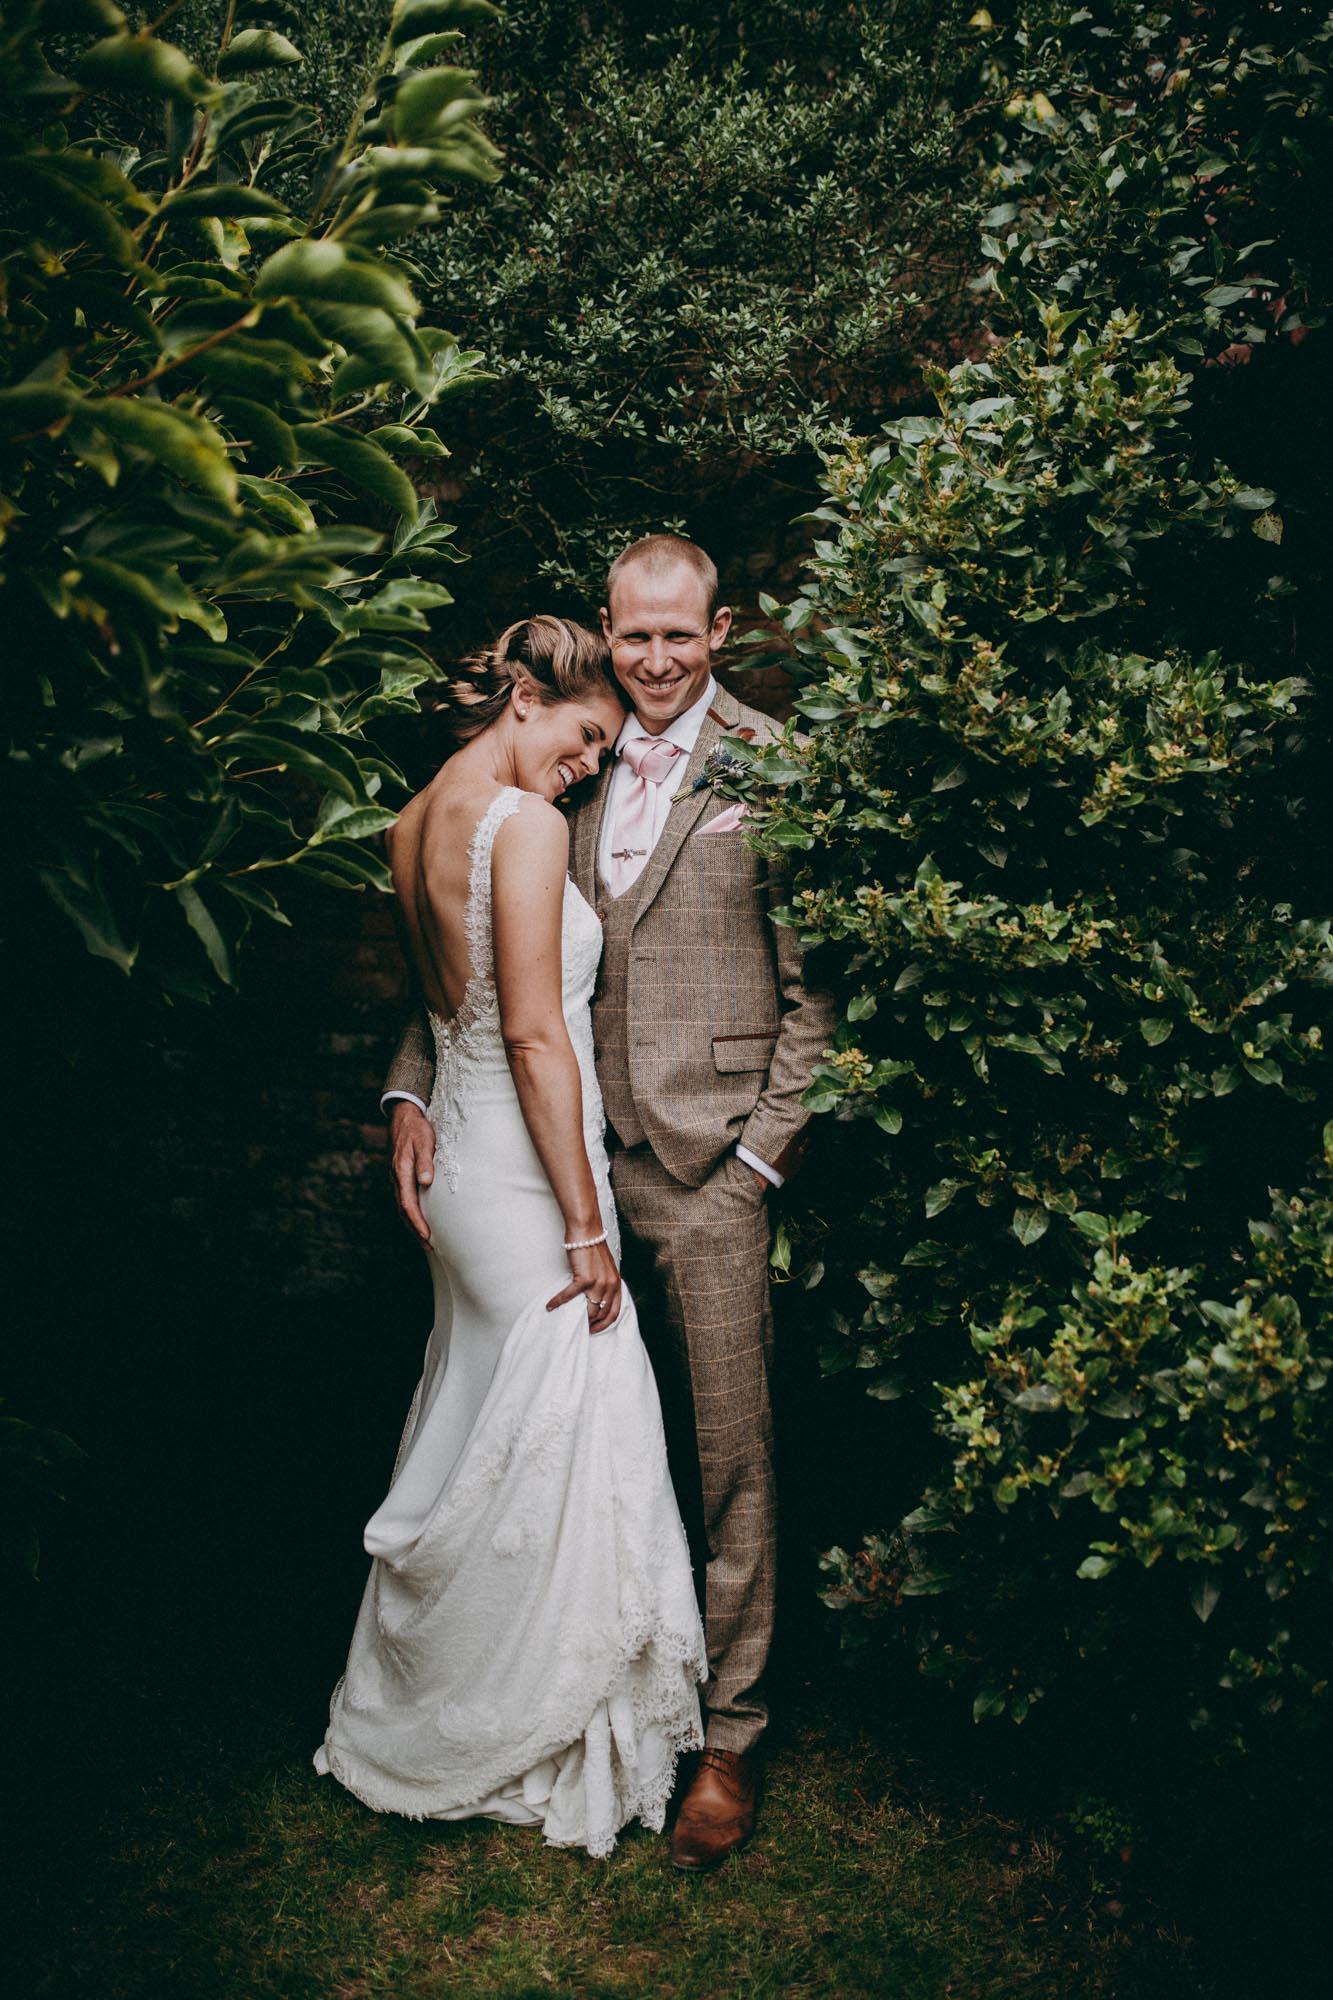 cotswold wedding photographer.jpg